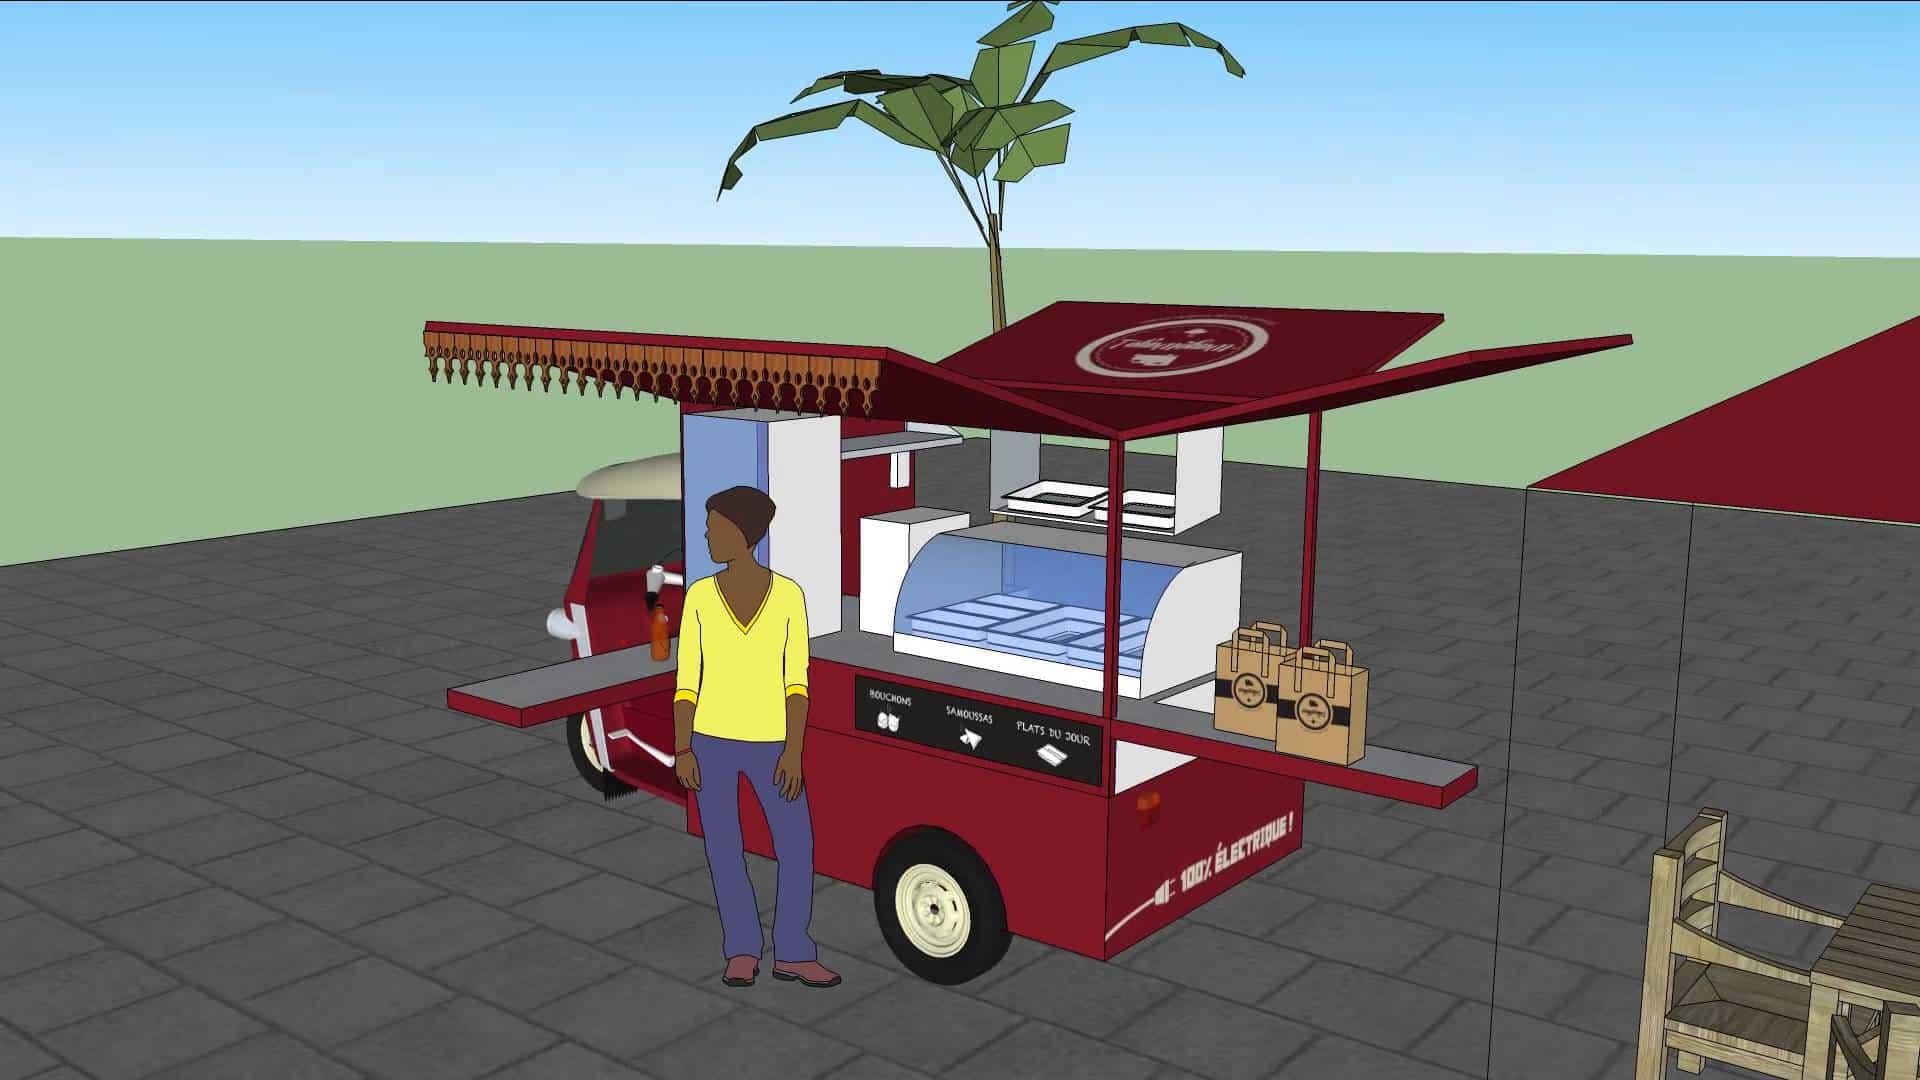 Las Vegas Events For Food Trucks